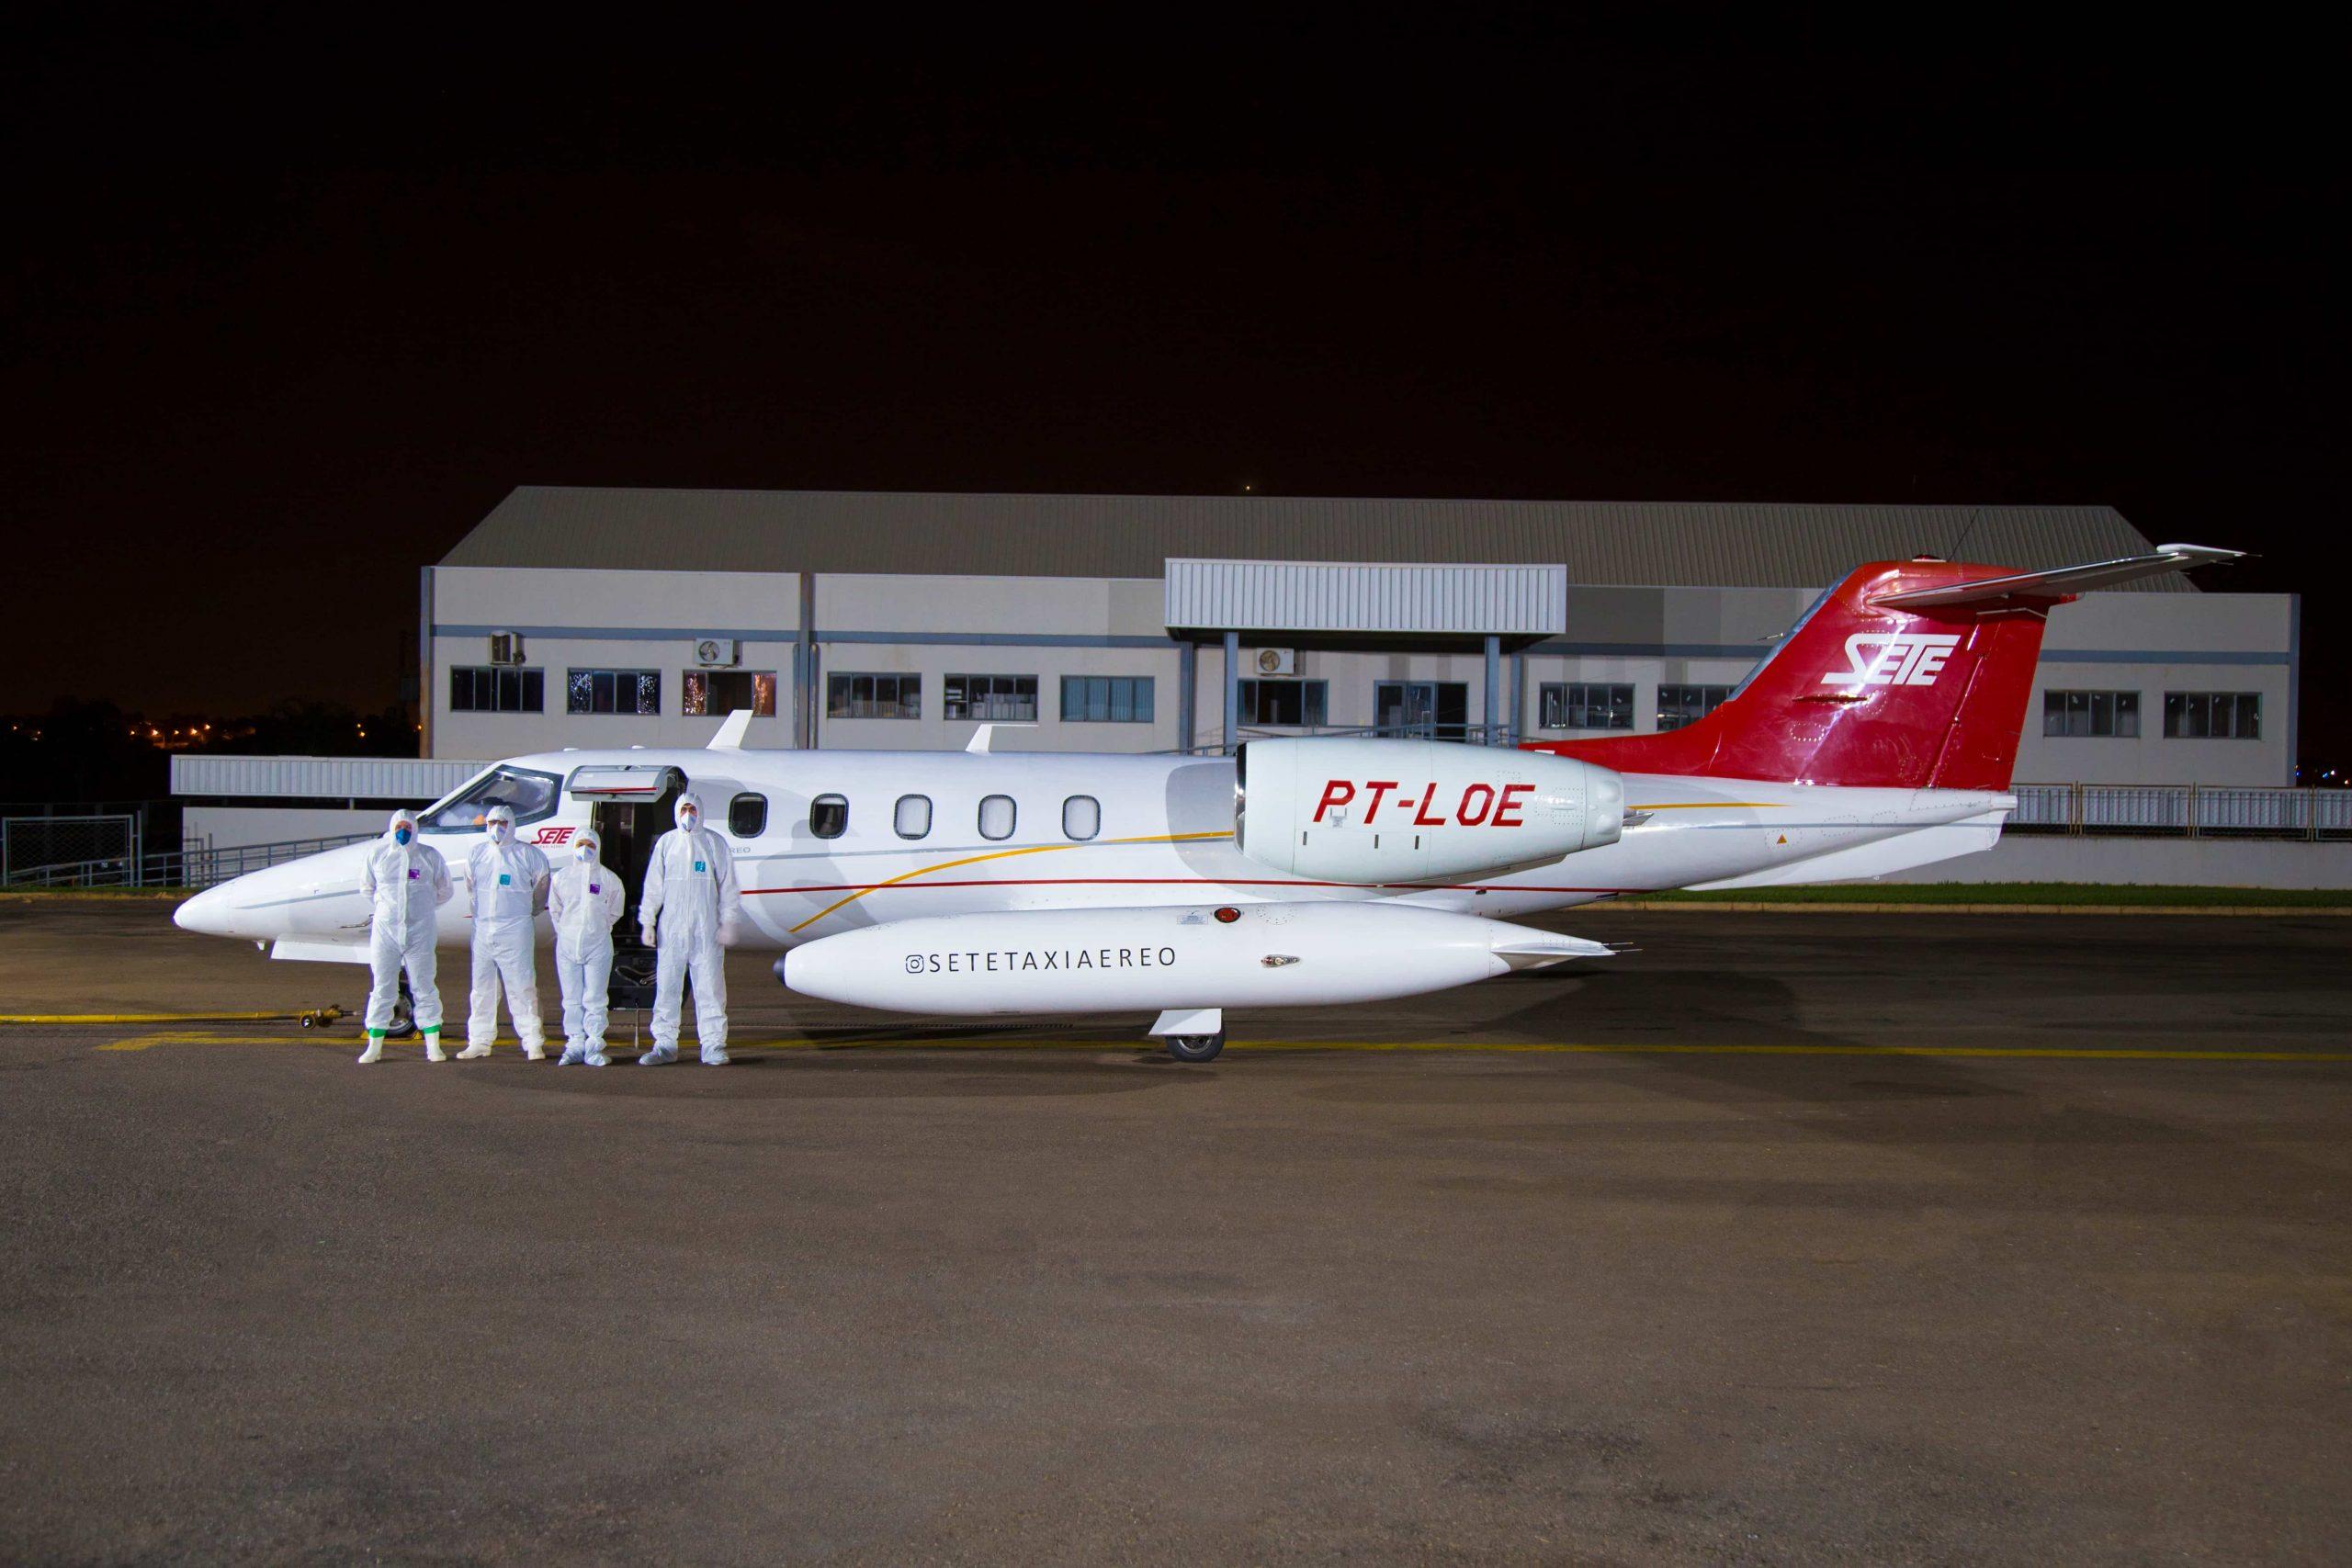 UTI Aérea COVID-19 de Parauapebas  para Brasília